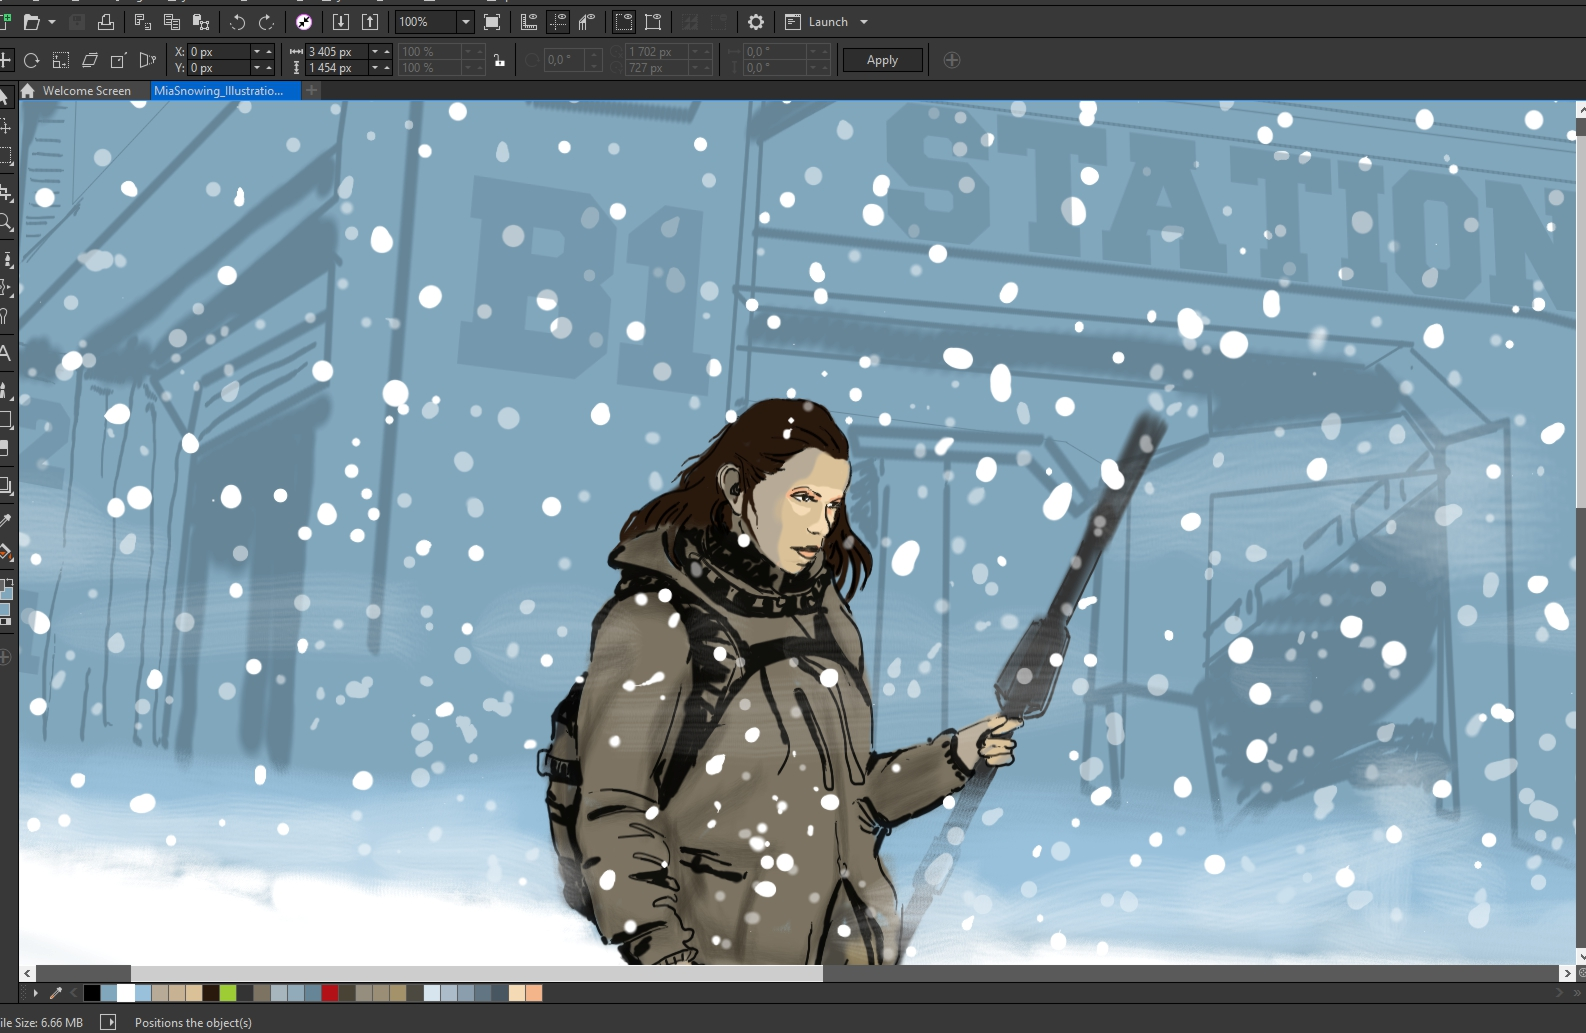 MiaTheExplorer_DetailFACE_Illustration-by_Stefan-Lindblad_2018